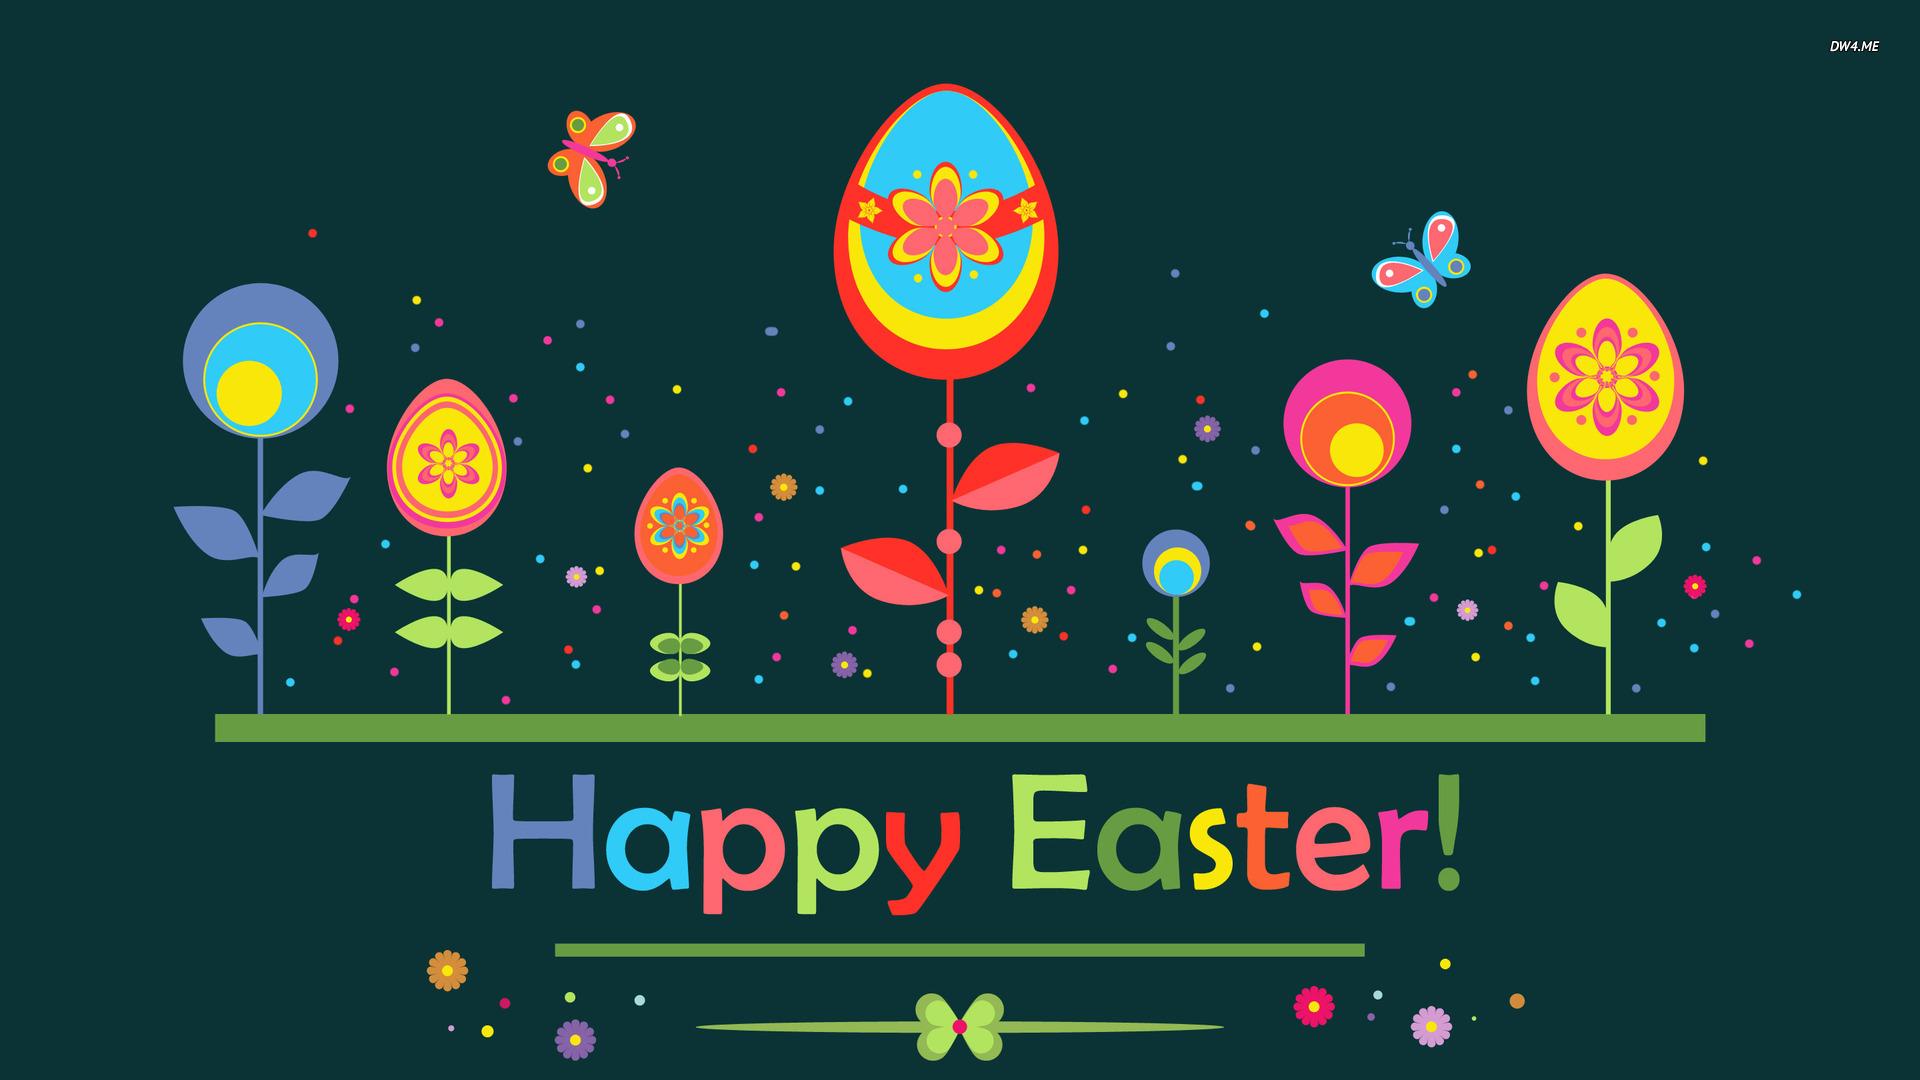 Happy Easter Desktop Wallpaper HD (21)